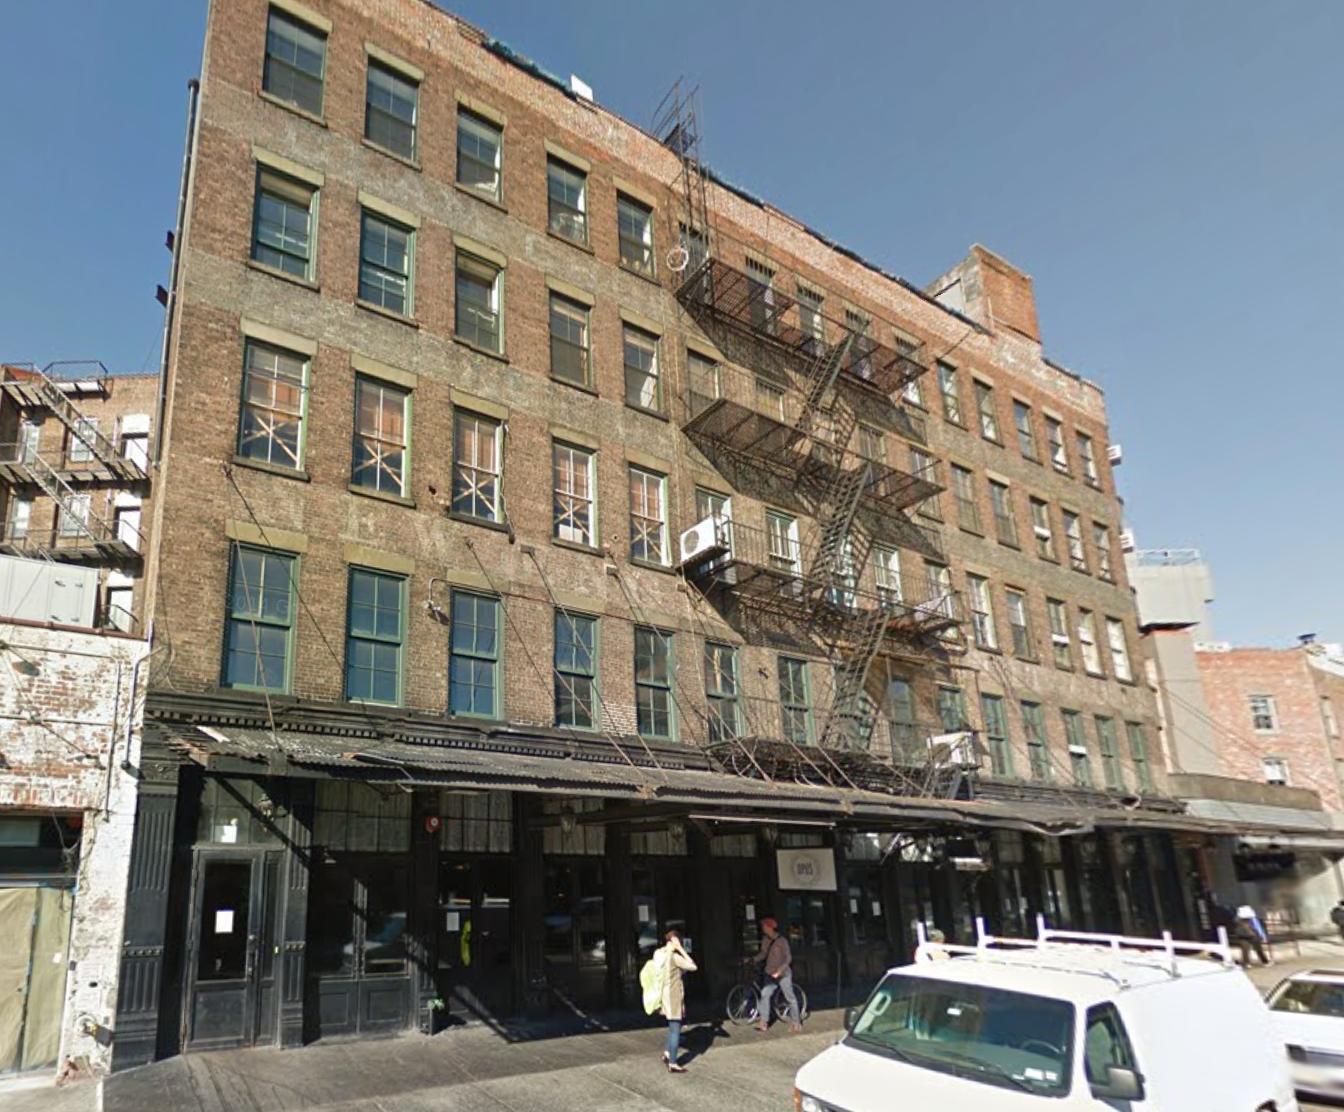 55 Gransevoort Street